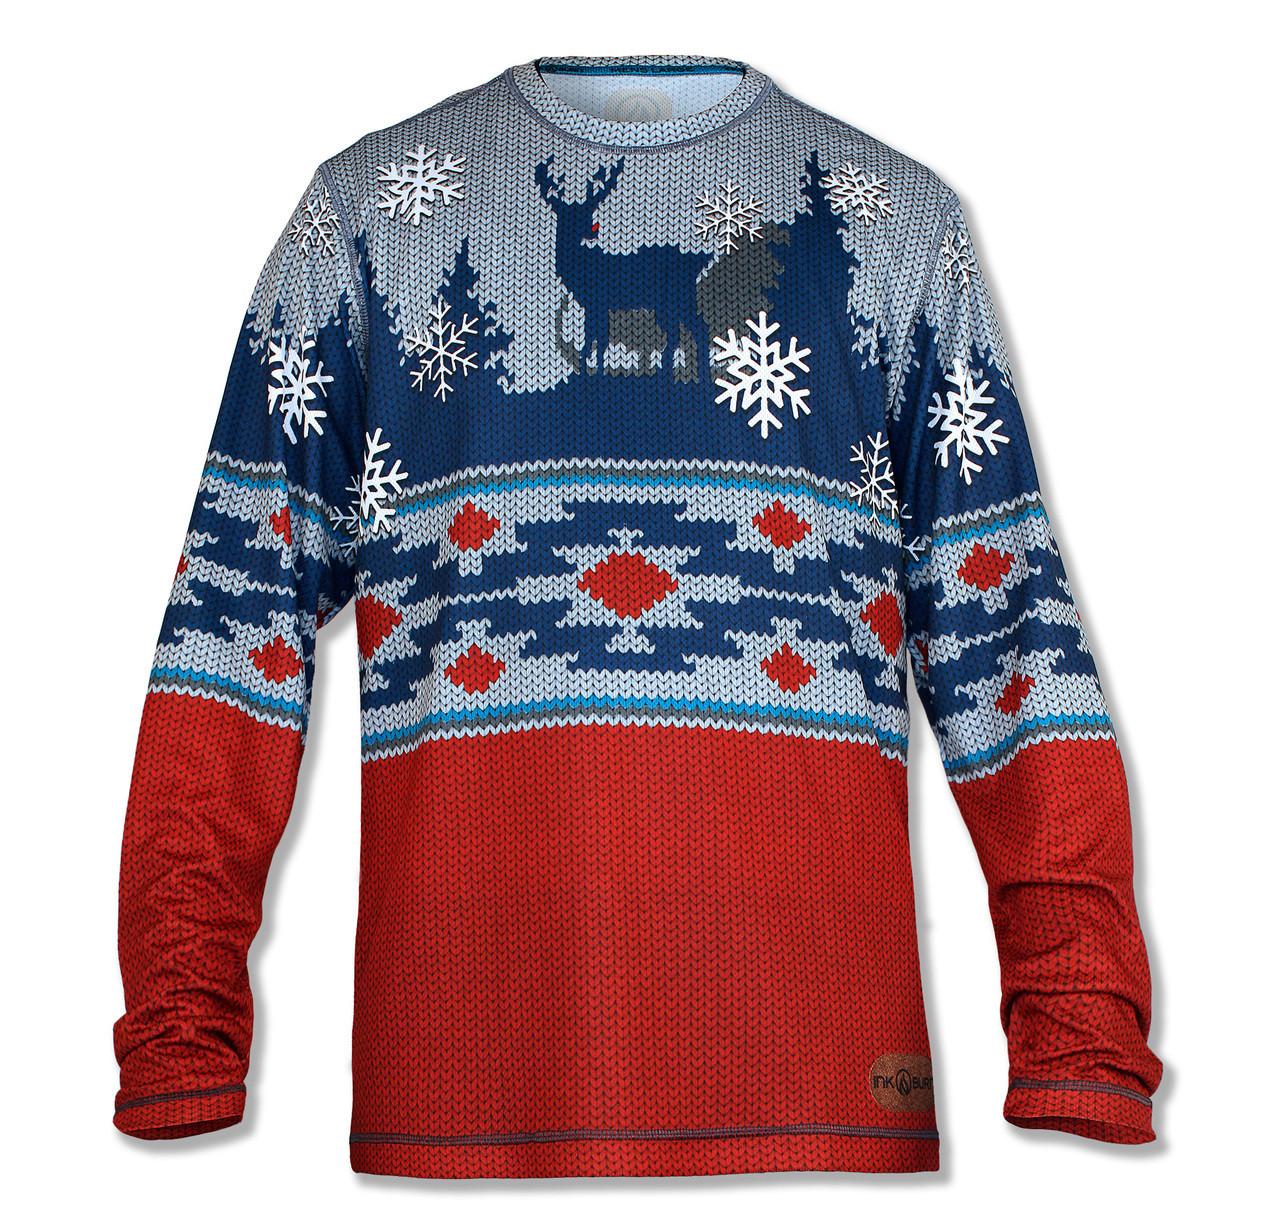 4dfbc08b1d645 INKnBURN Men s 2018 Holiday Sweater Tech Shirt